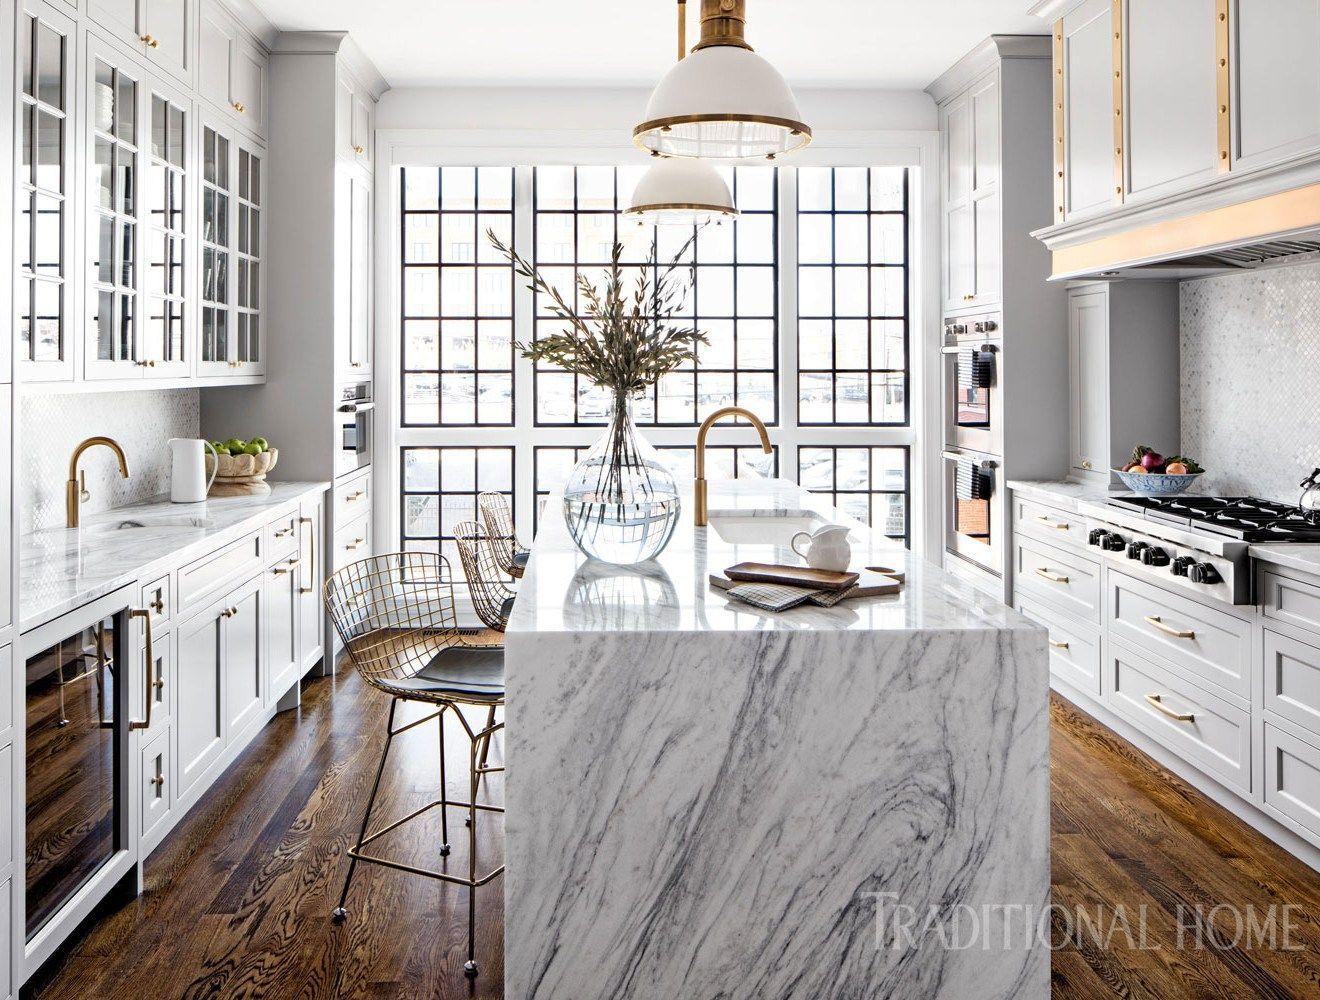 Glamorous White Kitchen Designed by Interior Designer Bria Hammel - #Bria #By #designed #designer #Glamorous #Hammel #interior, #KITCHEN #WHITE